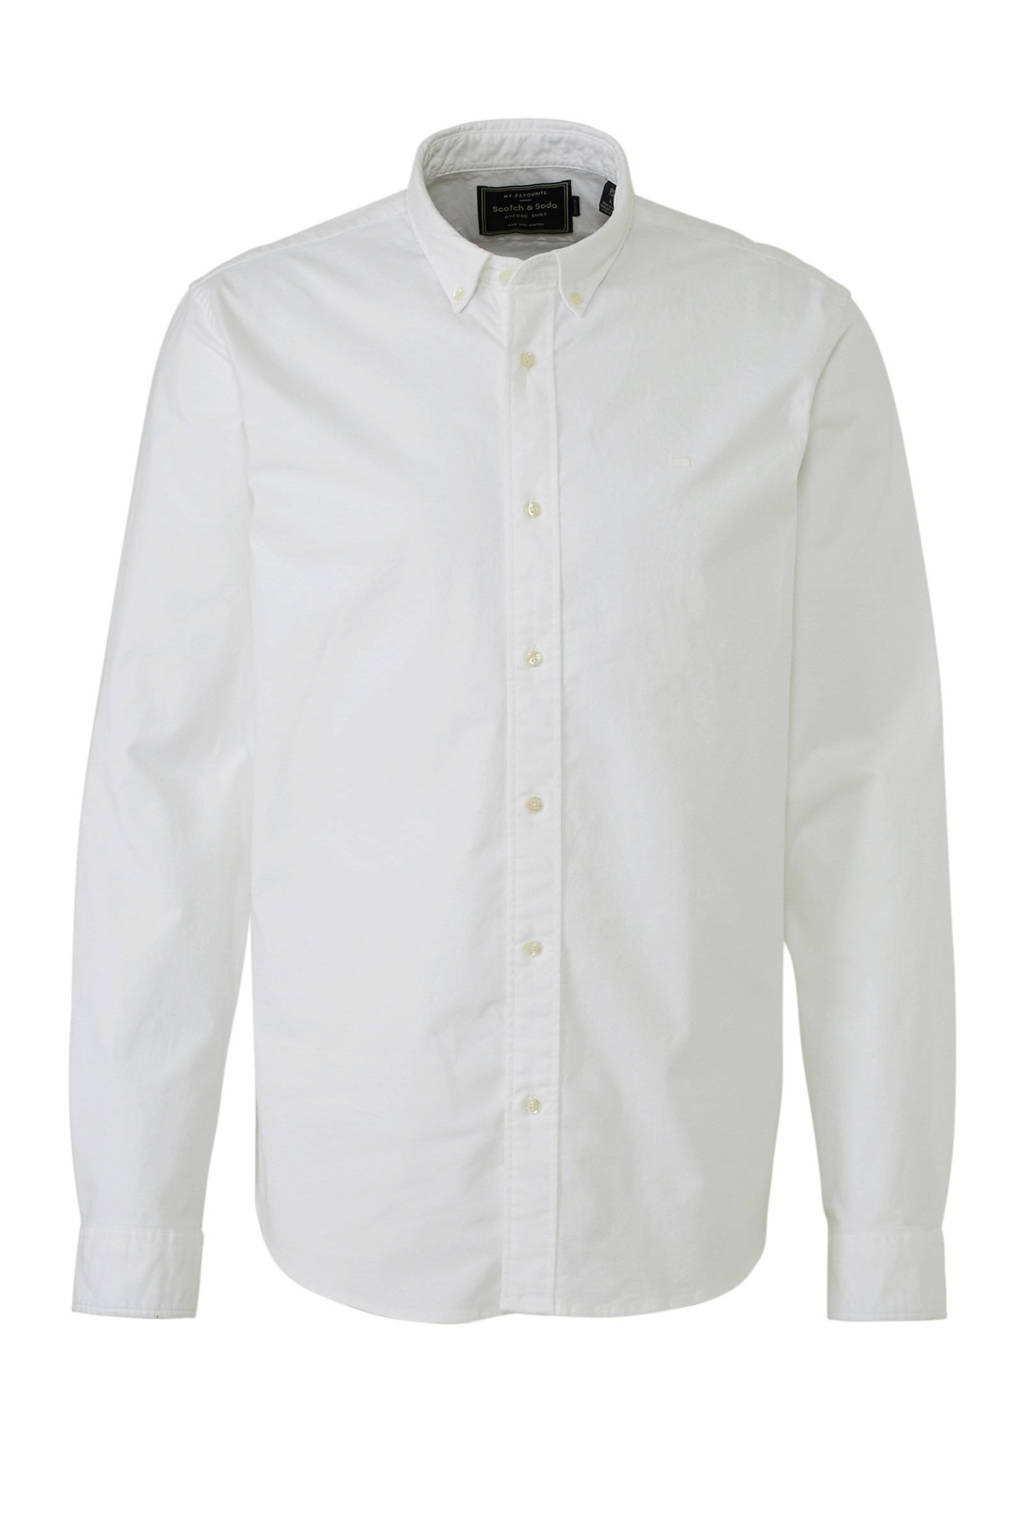 Scotch & Soda regular fit overhemd wit, Wit